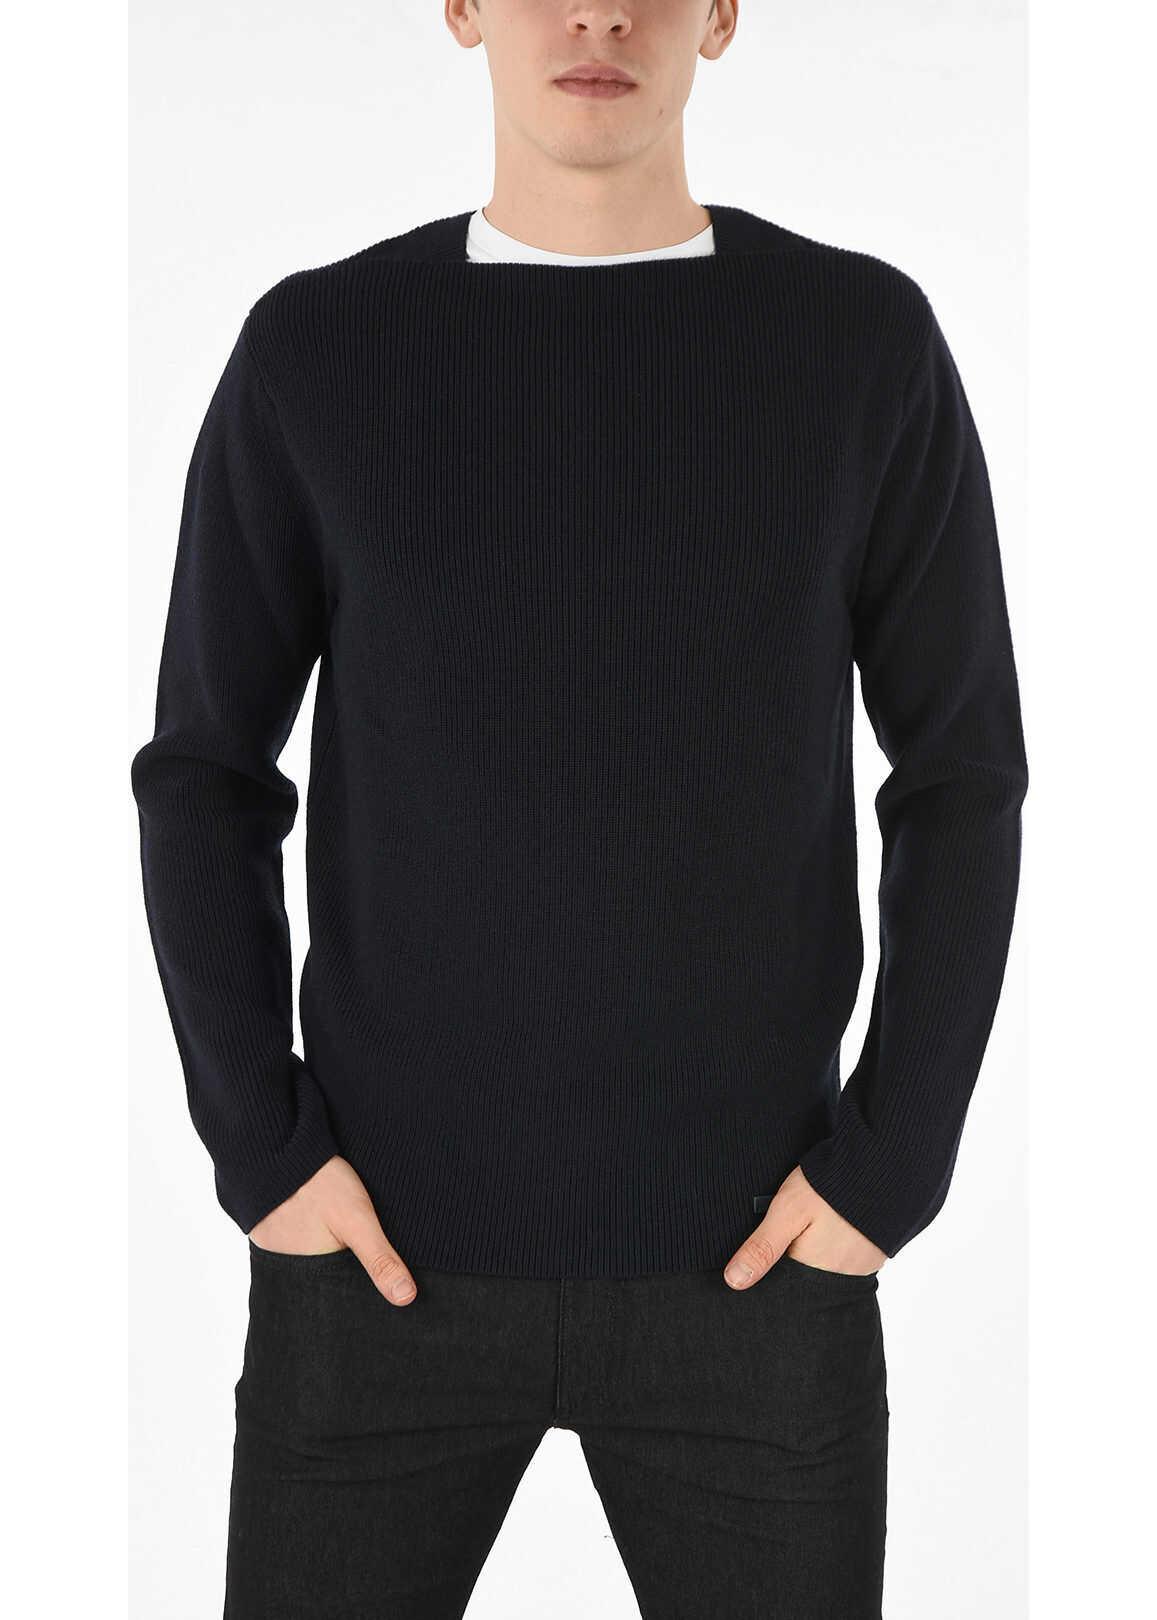 Armani EMPORIO Virgin Wool Sweater BLUE